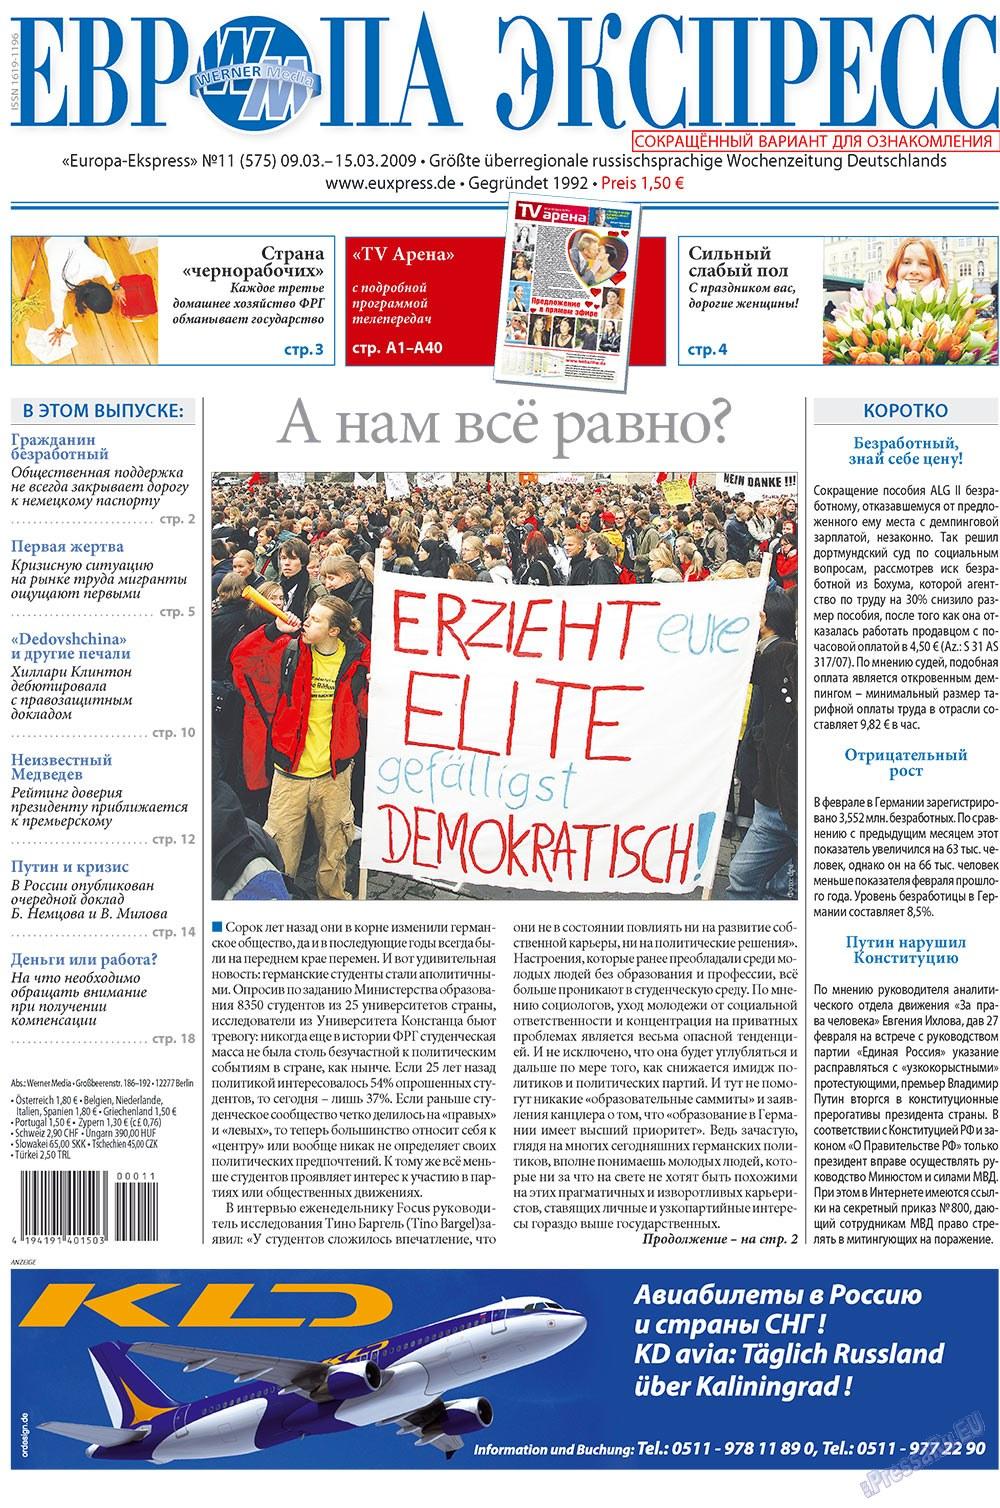 Европа экспресс (газета). 2009 год, номер 11, стр. 1